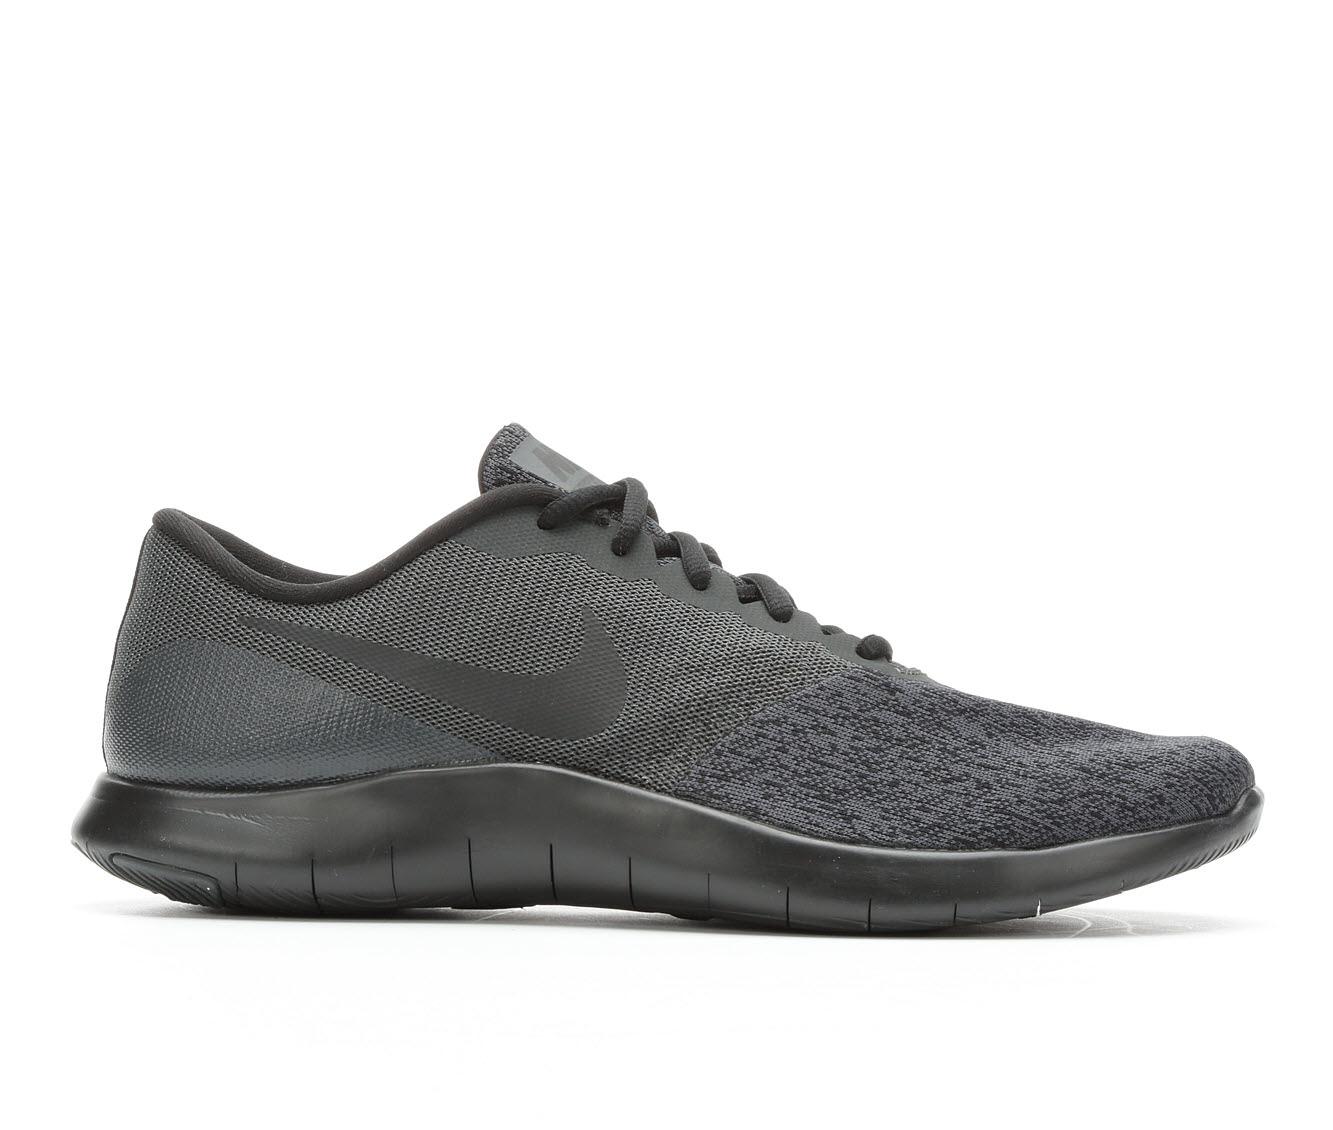 Men's Nike Flex Contact Running Shoes (Black - Size 7) 1682778